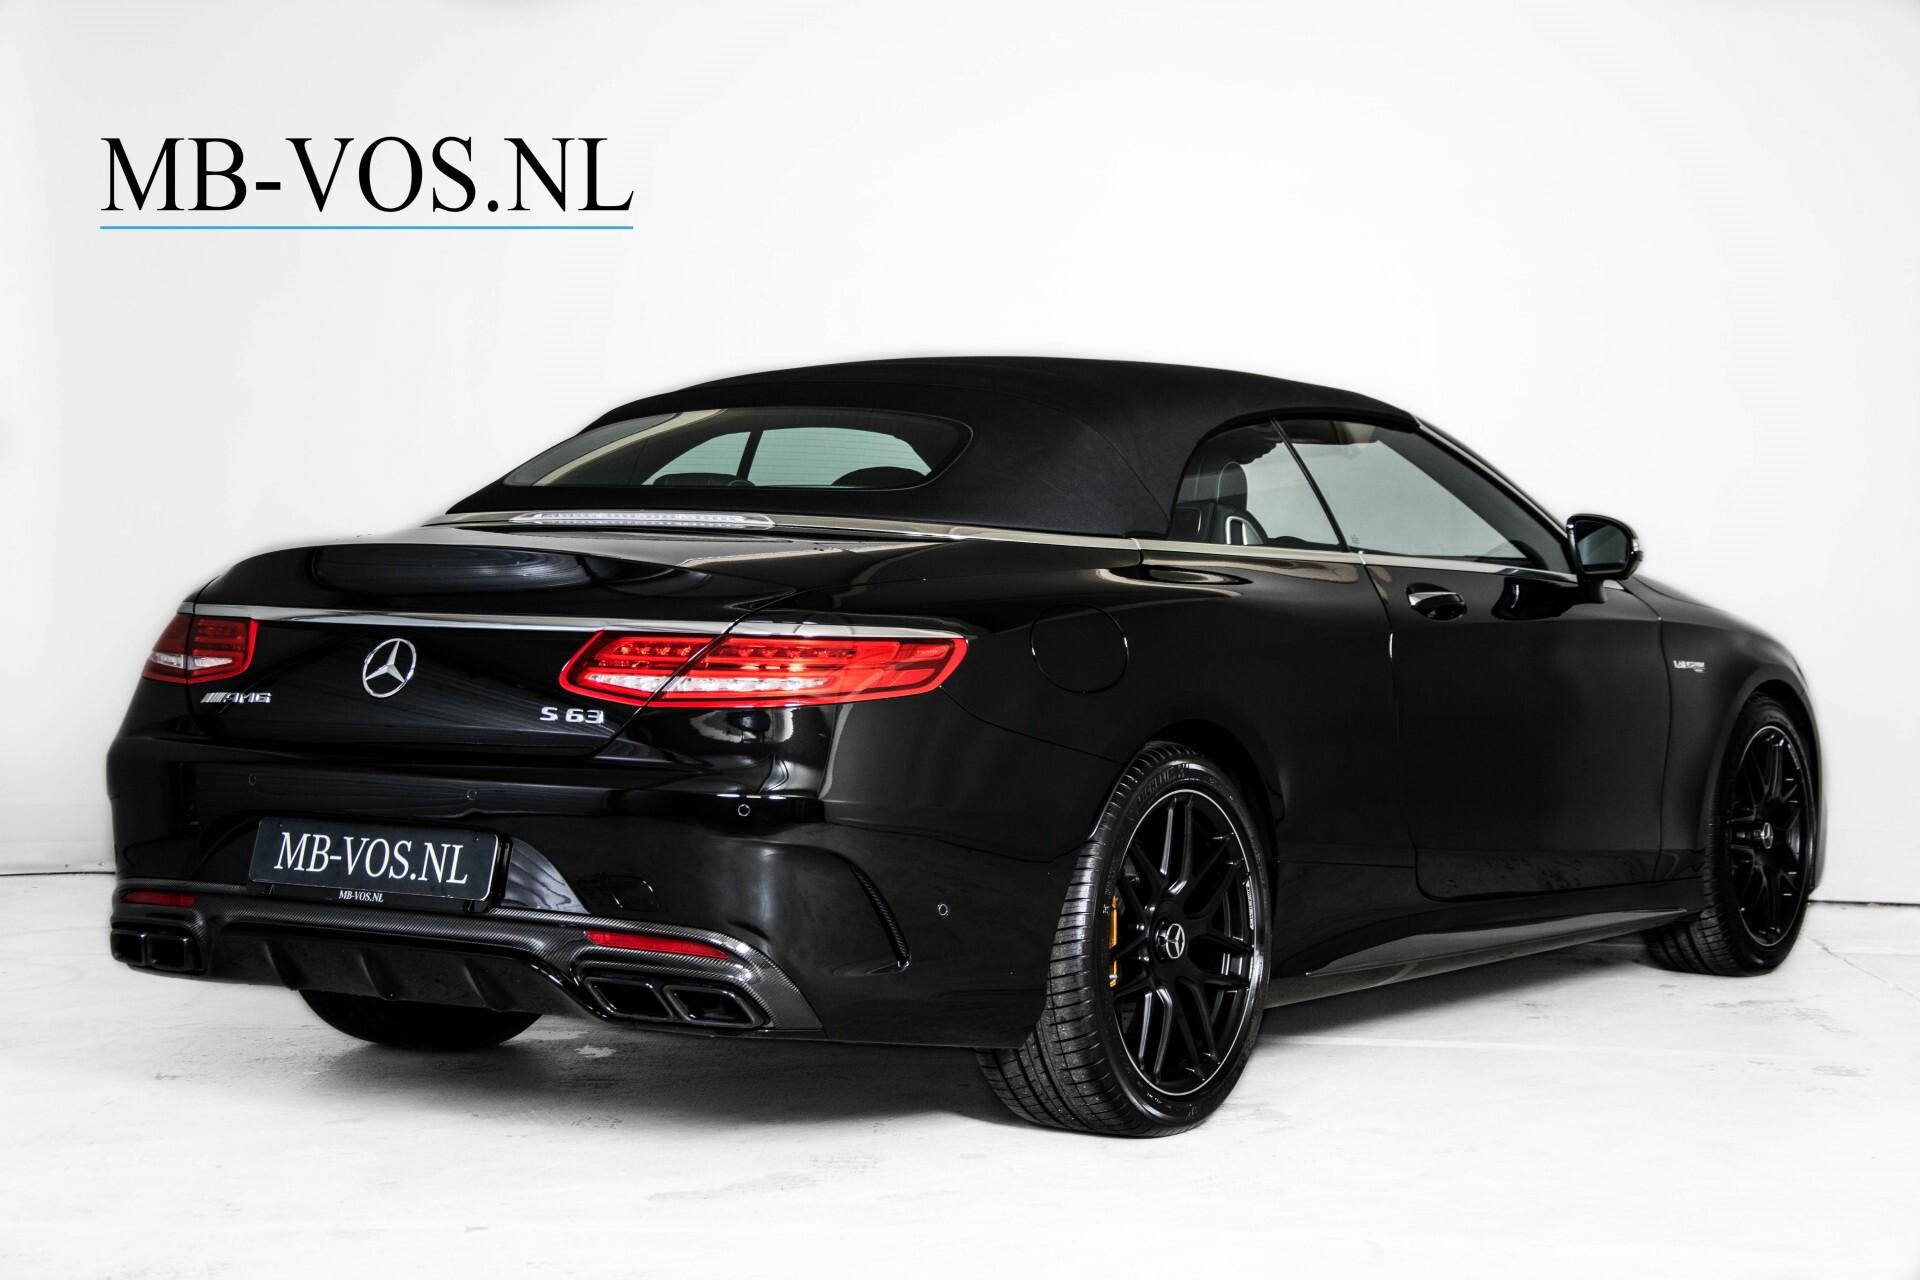 Mercedes-Benz S-Klasse Cabrio 63 AMG 4-M Ceramic/Designo/Carbon/Burmester High End Aut Foto 4